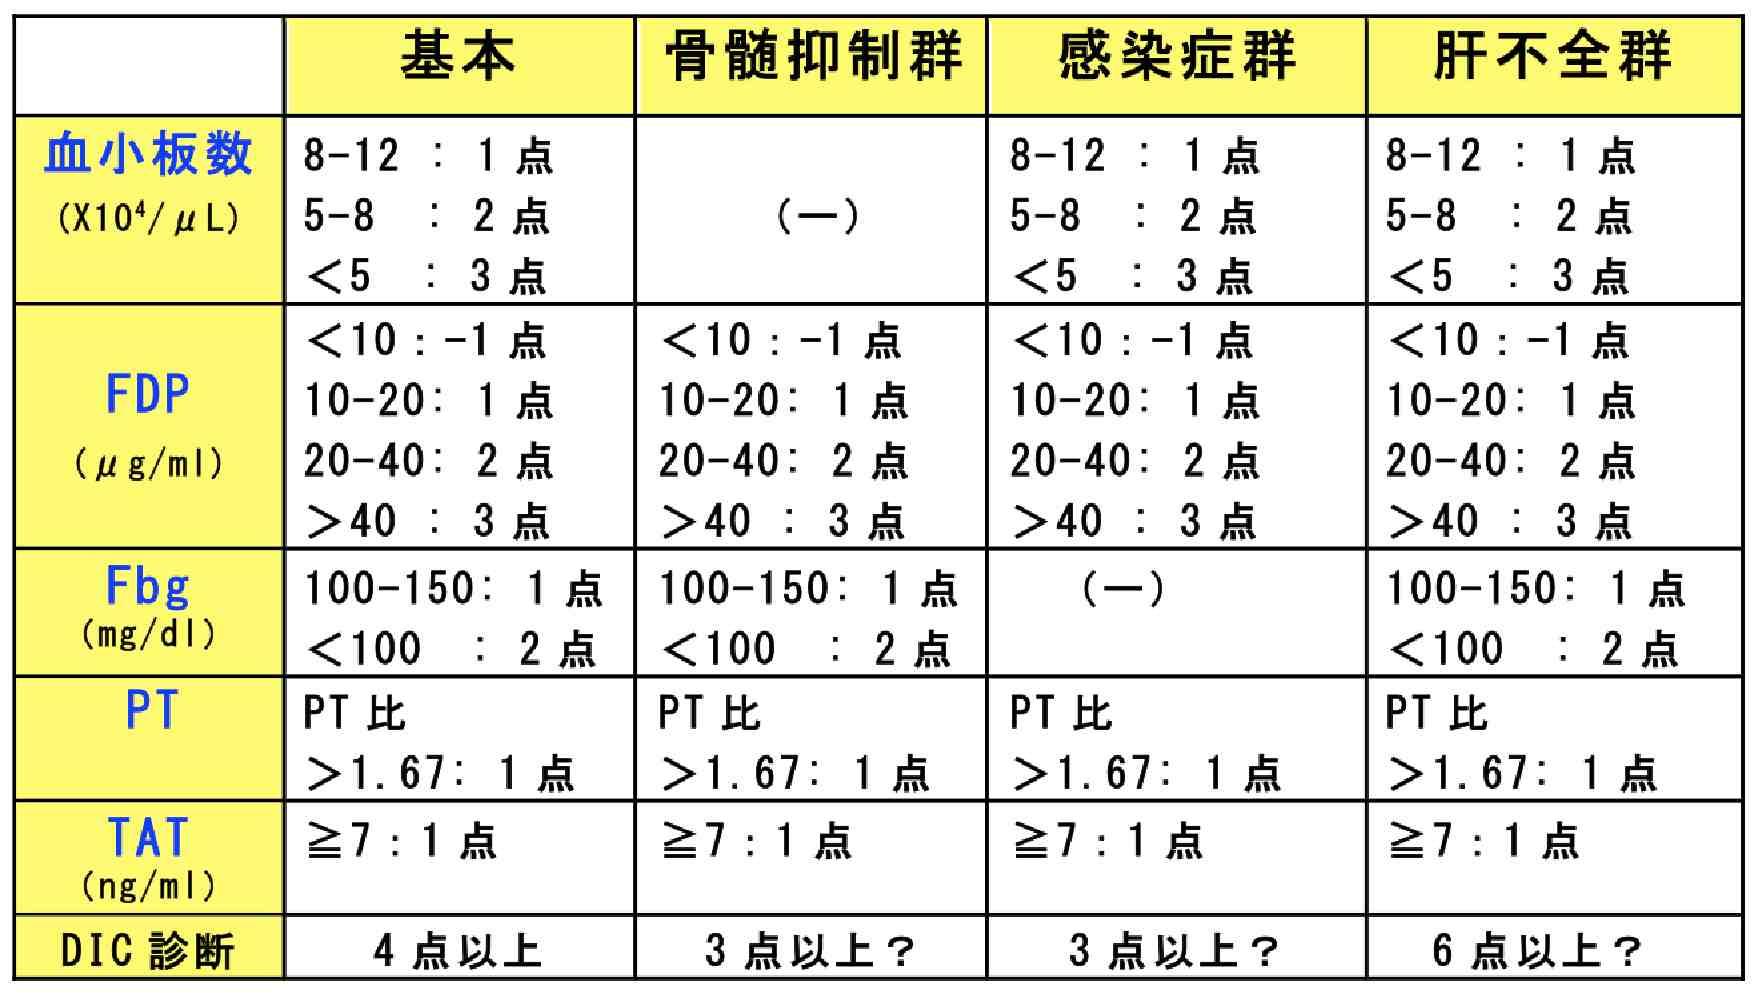 Dic 診断 基準 日本血栓止血学会 DIC診断基準 2017年版